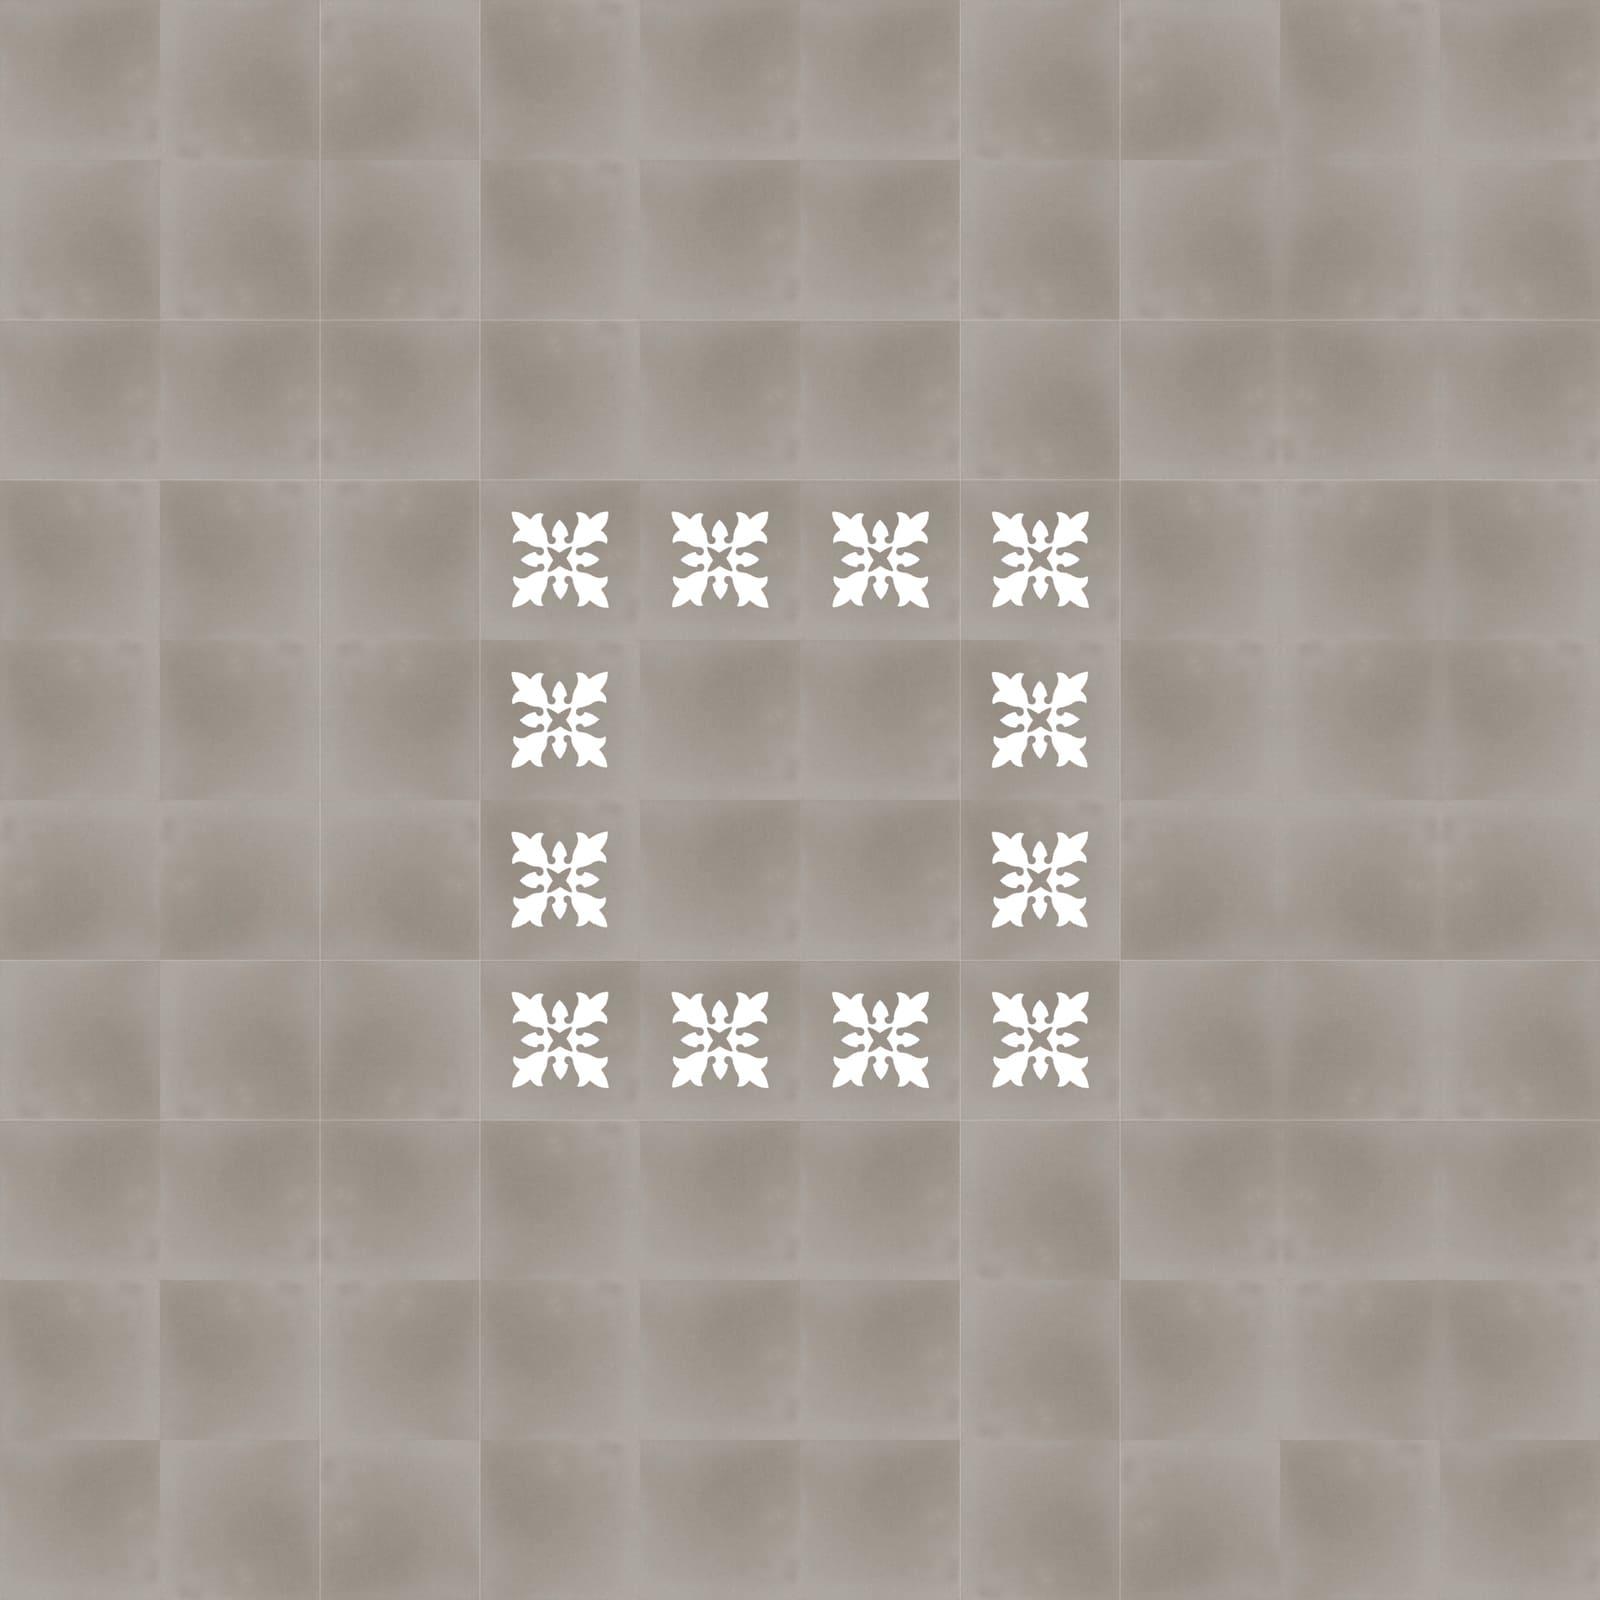 zementfliesen-verlegemuster-nummer-10952-viaplatten   10952